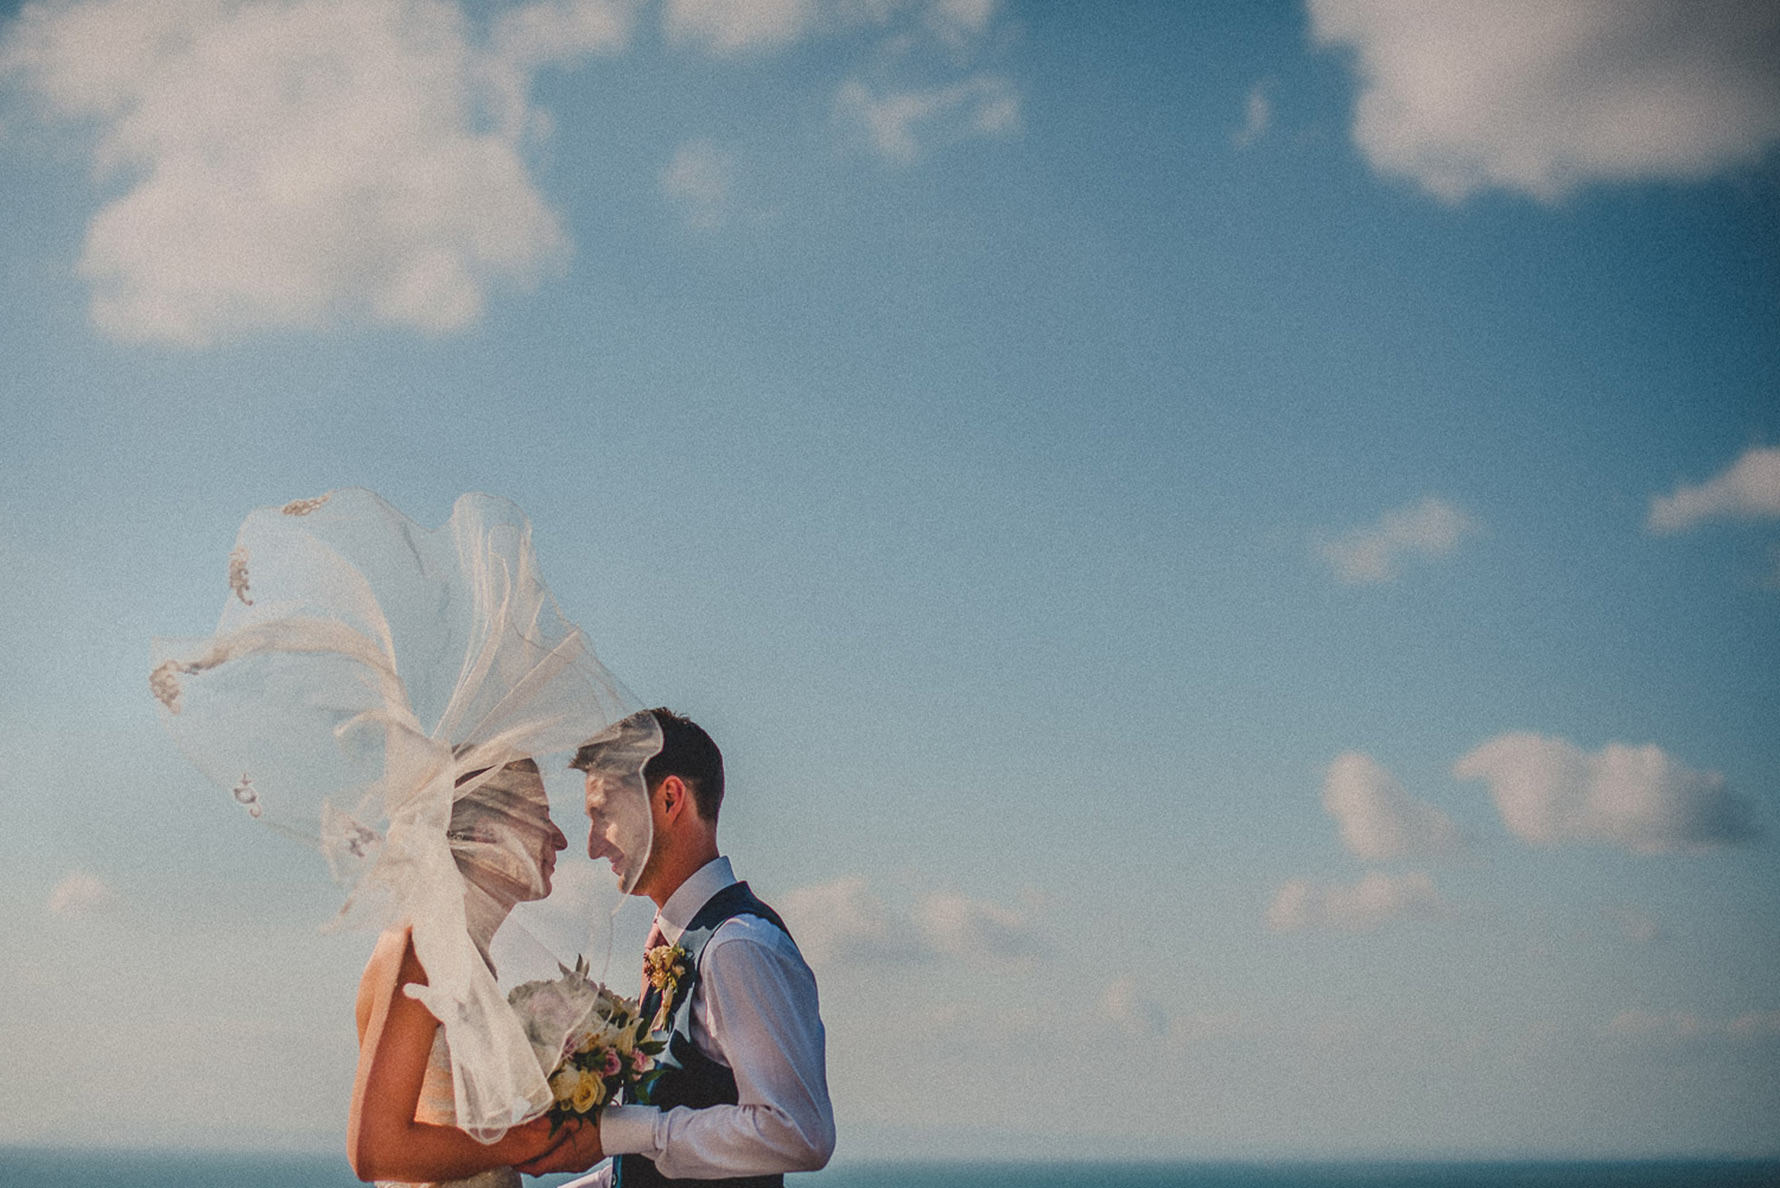 fotografo-matrimonio-sorrento-livio-lacurre-fotografie